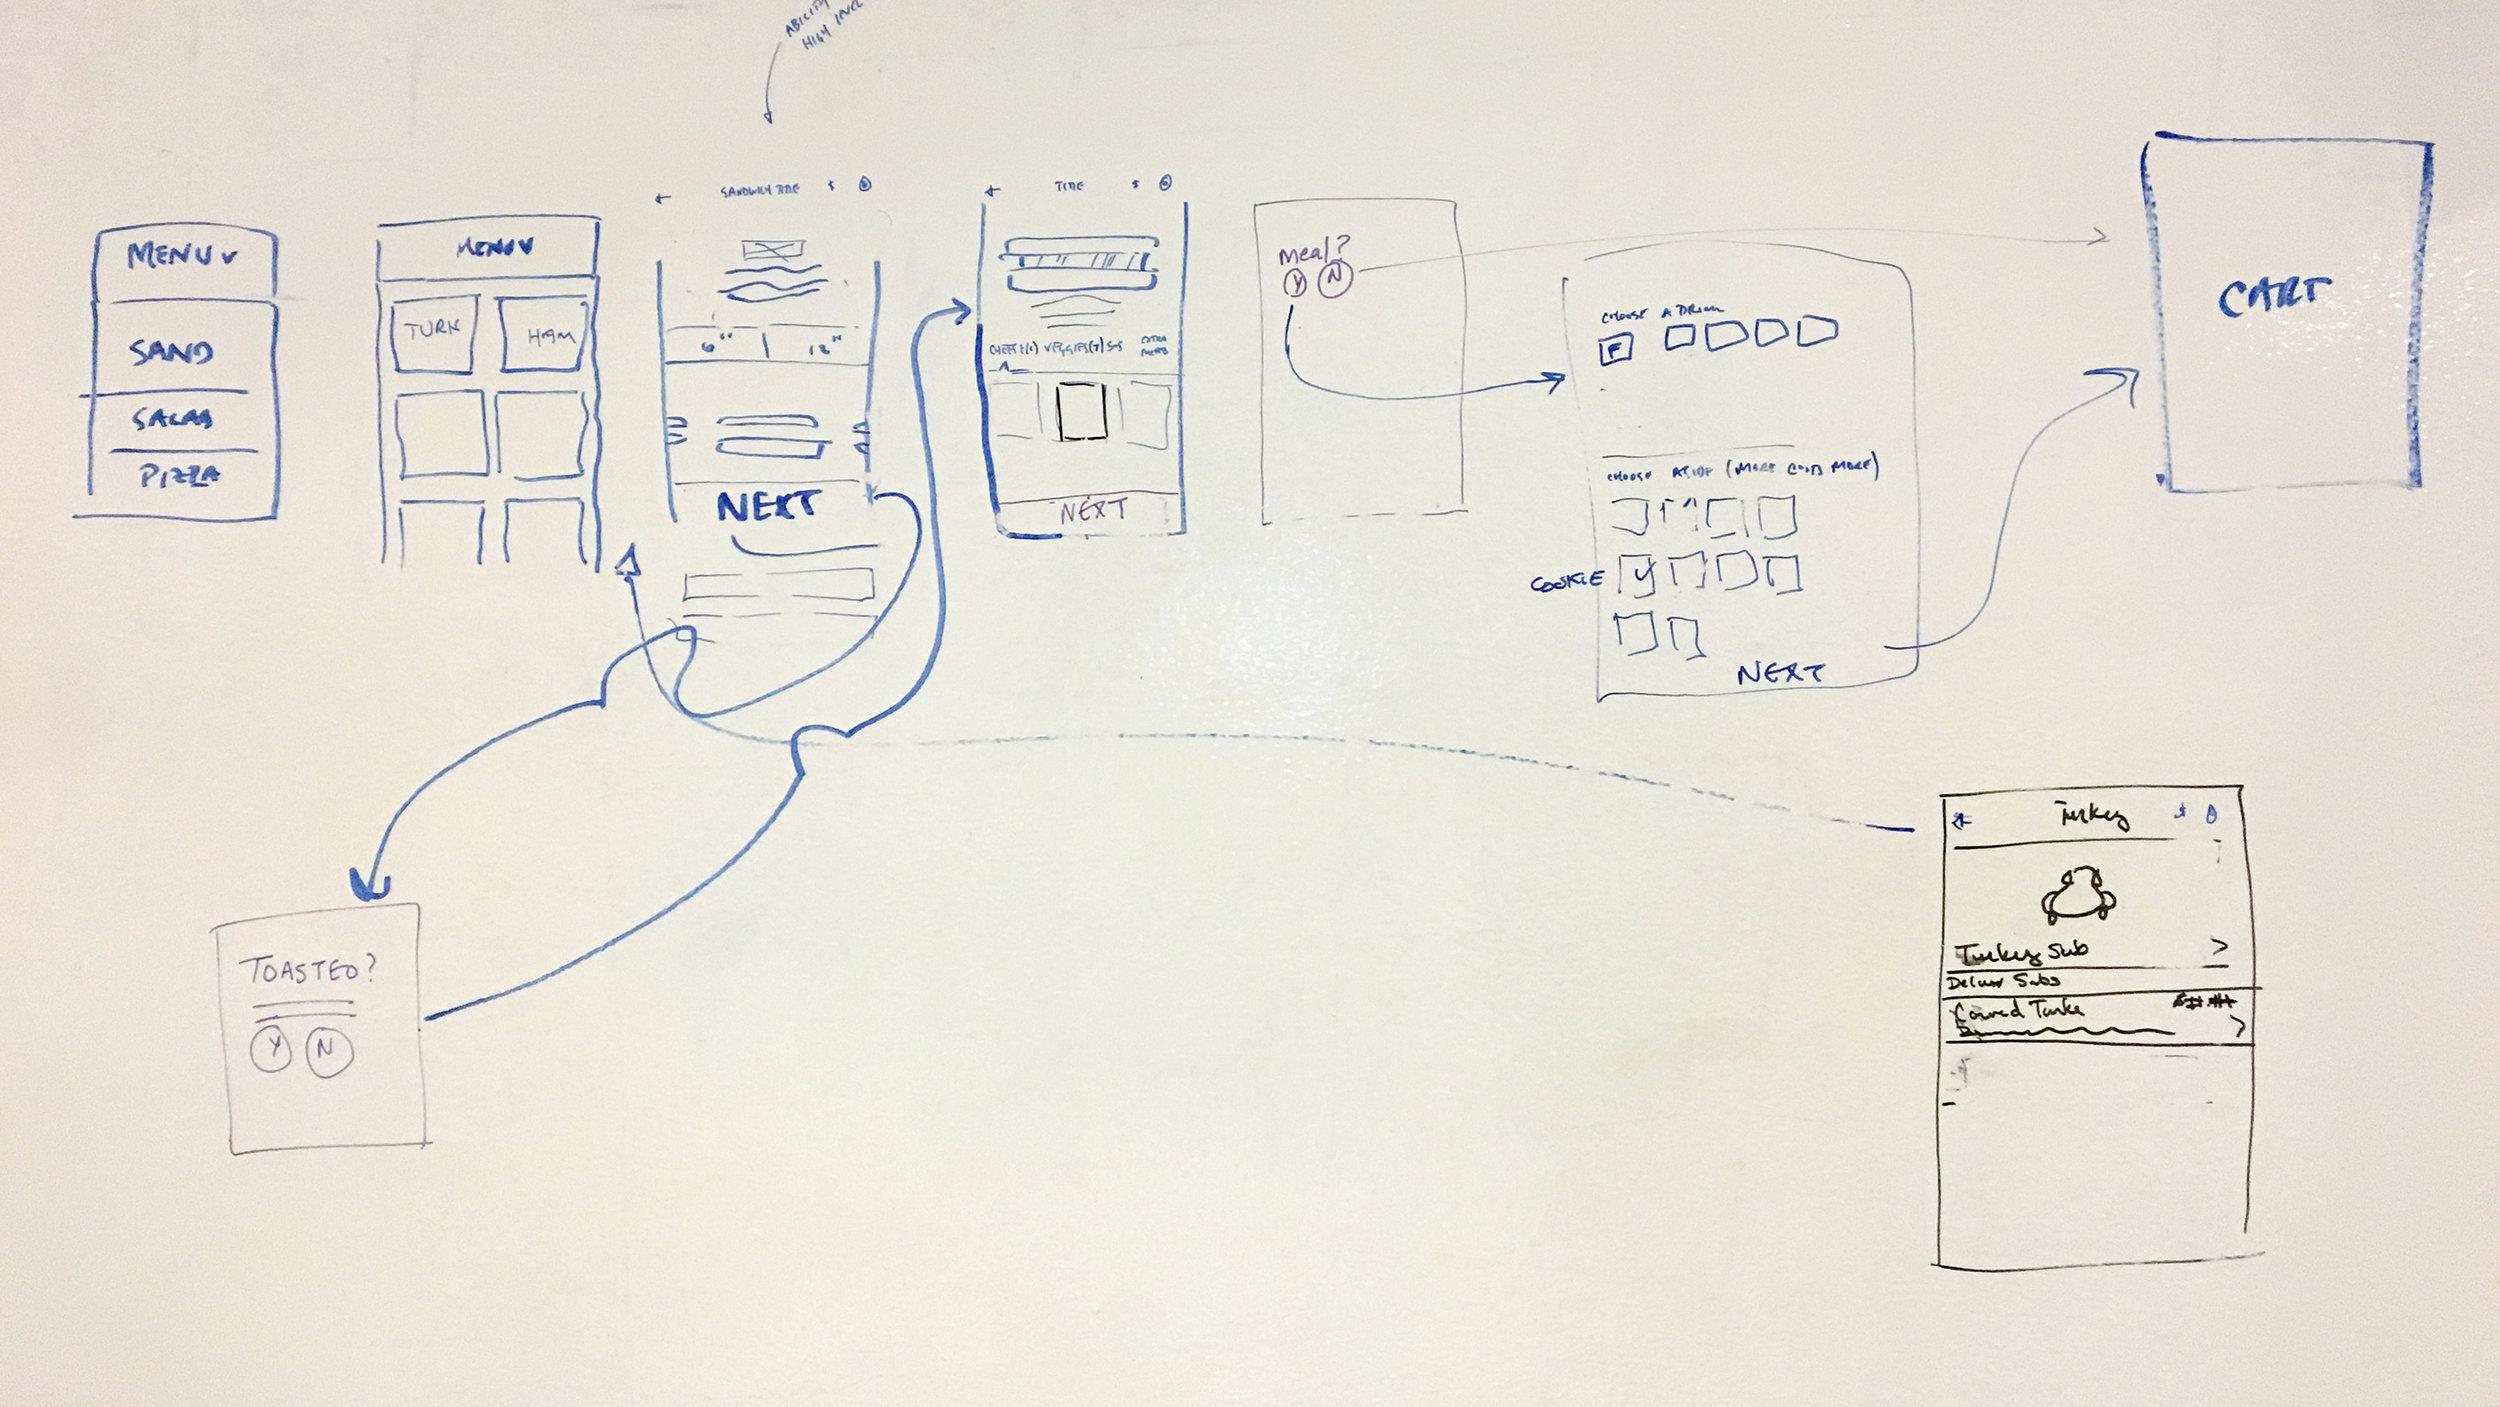 whiteboard sketch 04.JPG